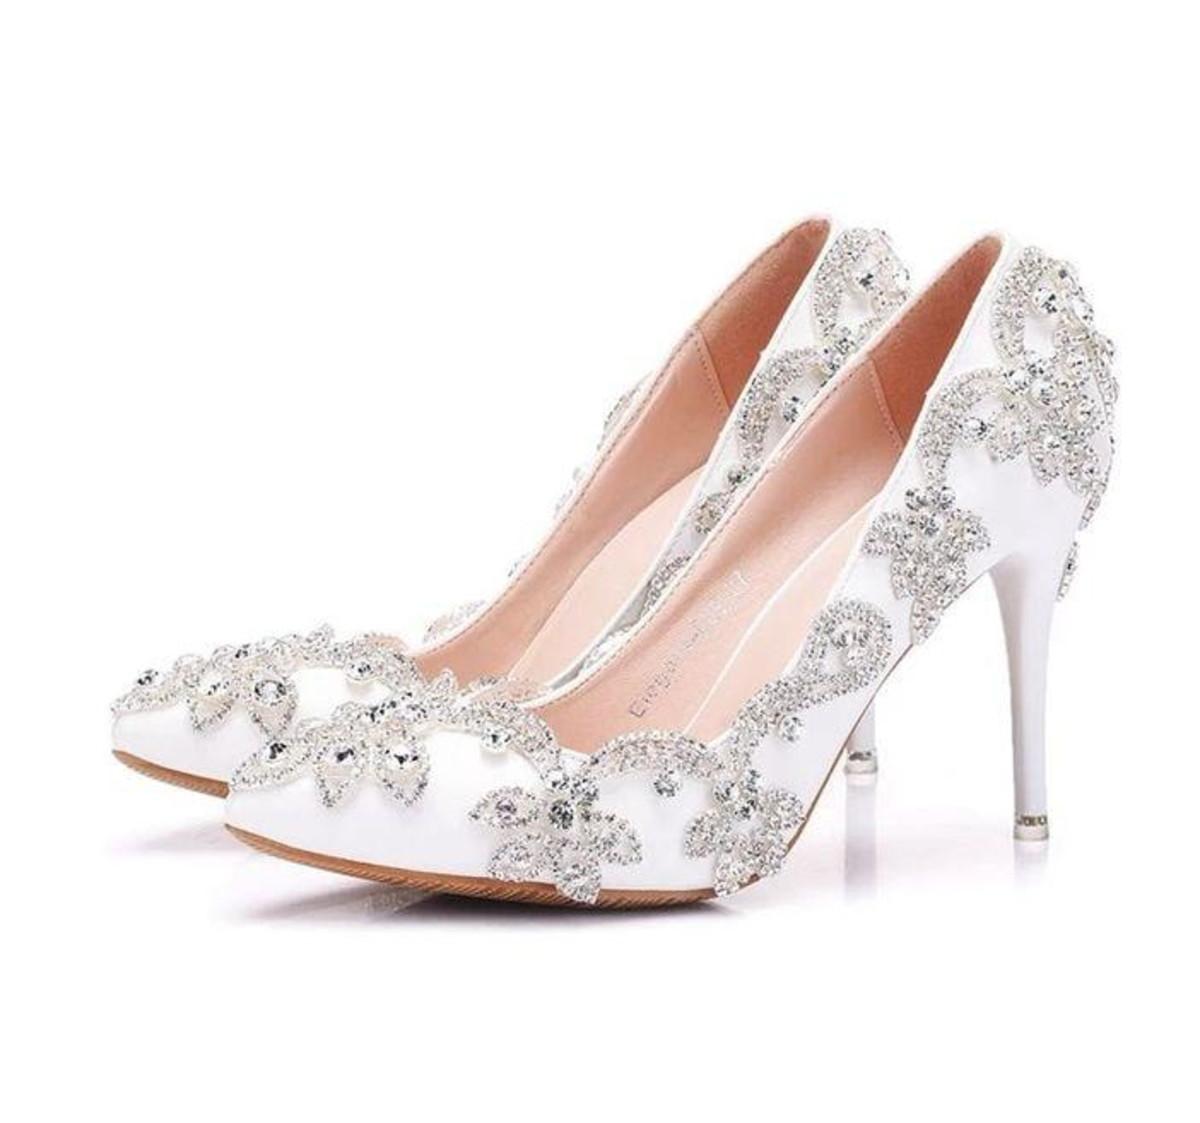 b2368a9713 Sapato de Noiva personalizado no Elo7